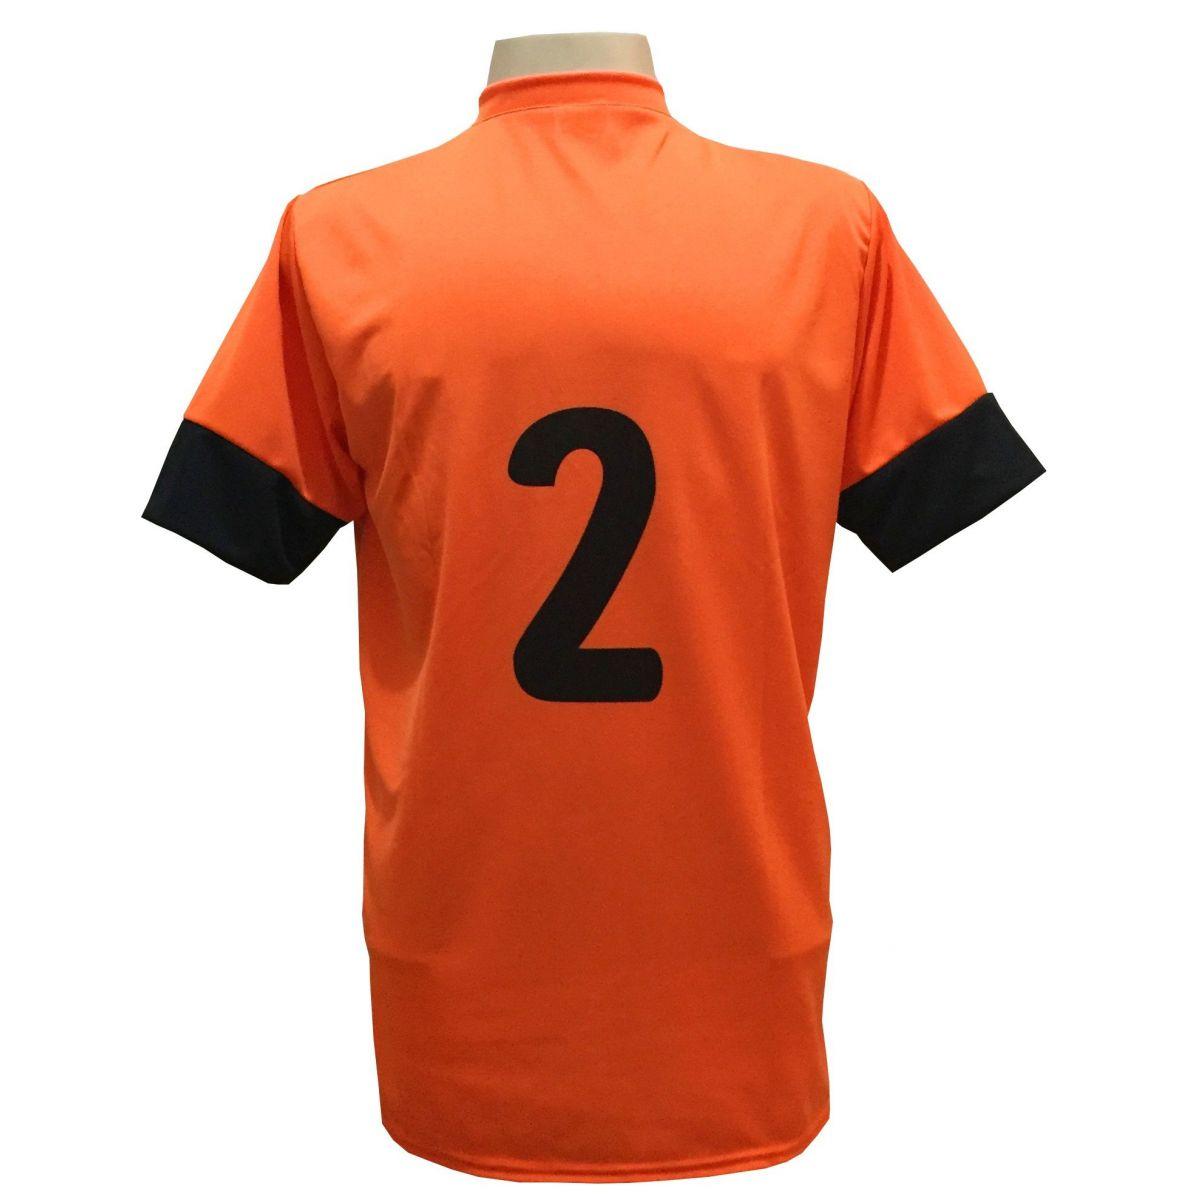 Jogo de Camisa com 18 unidades modelo Columbus Laranja/Preto + Brindes